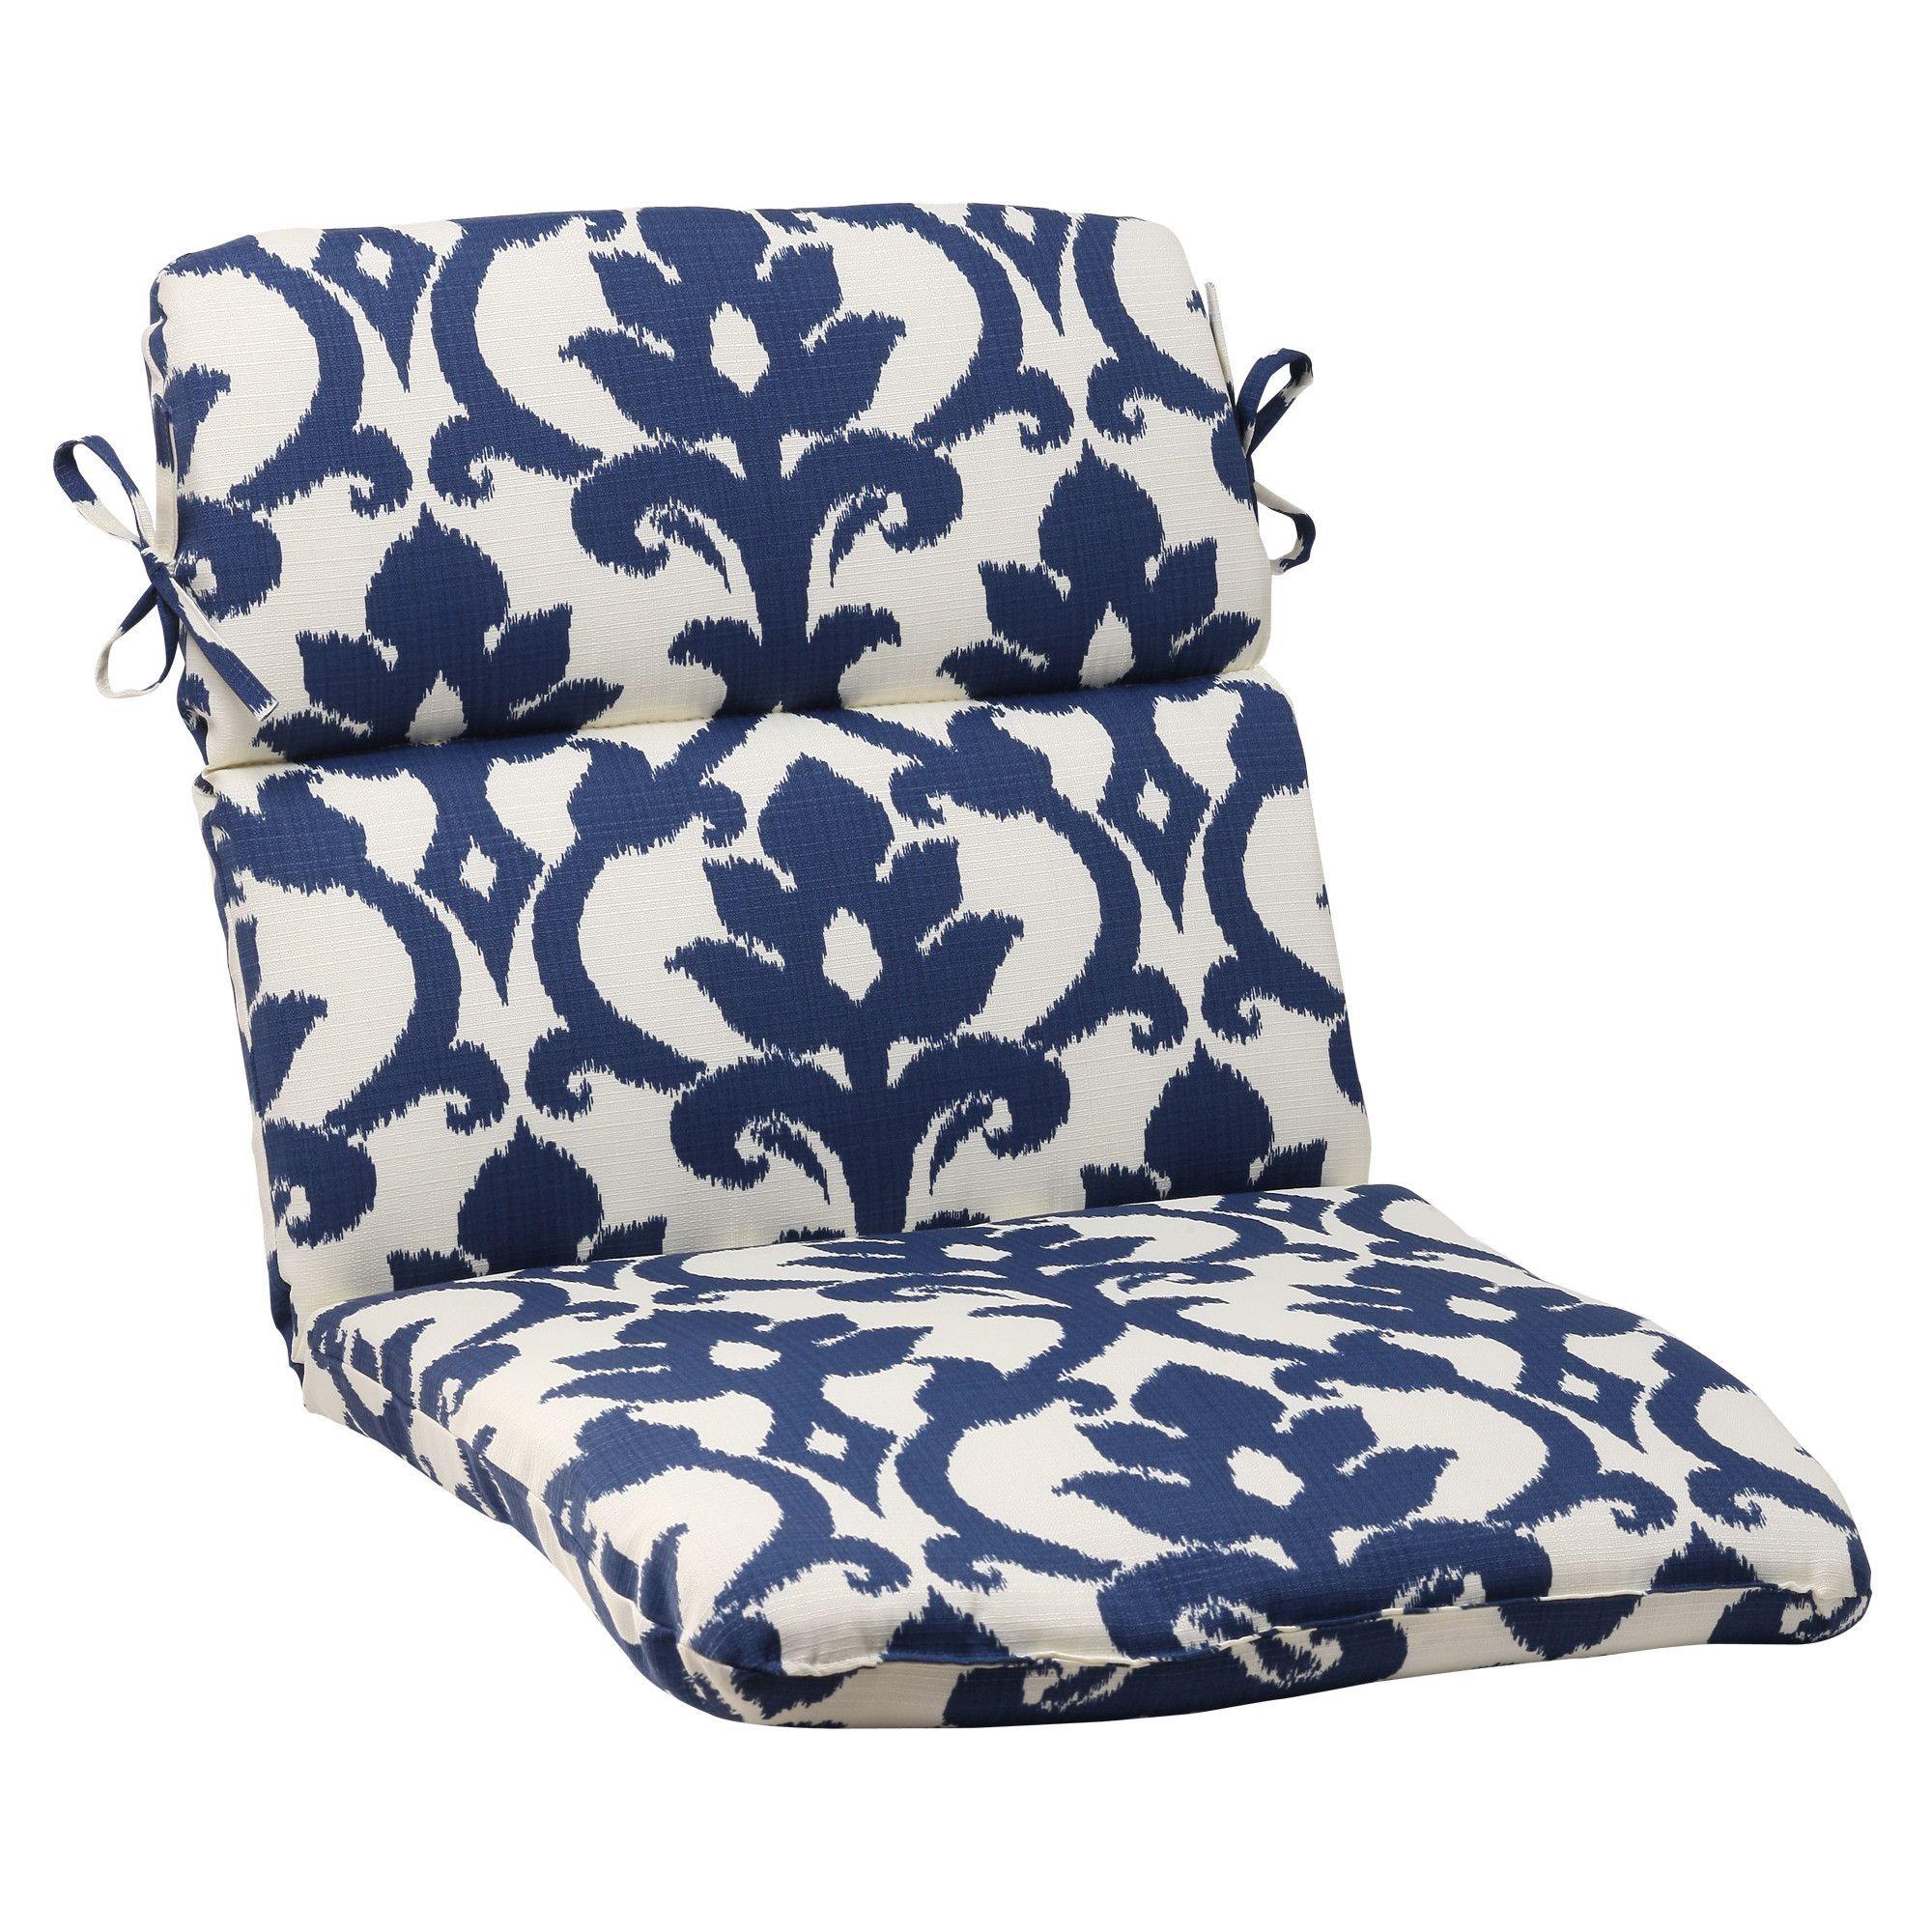 Pillow Perfect Bosco Outdoor Chair Cushion Round chair